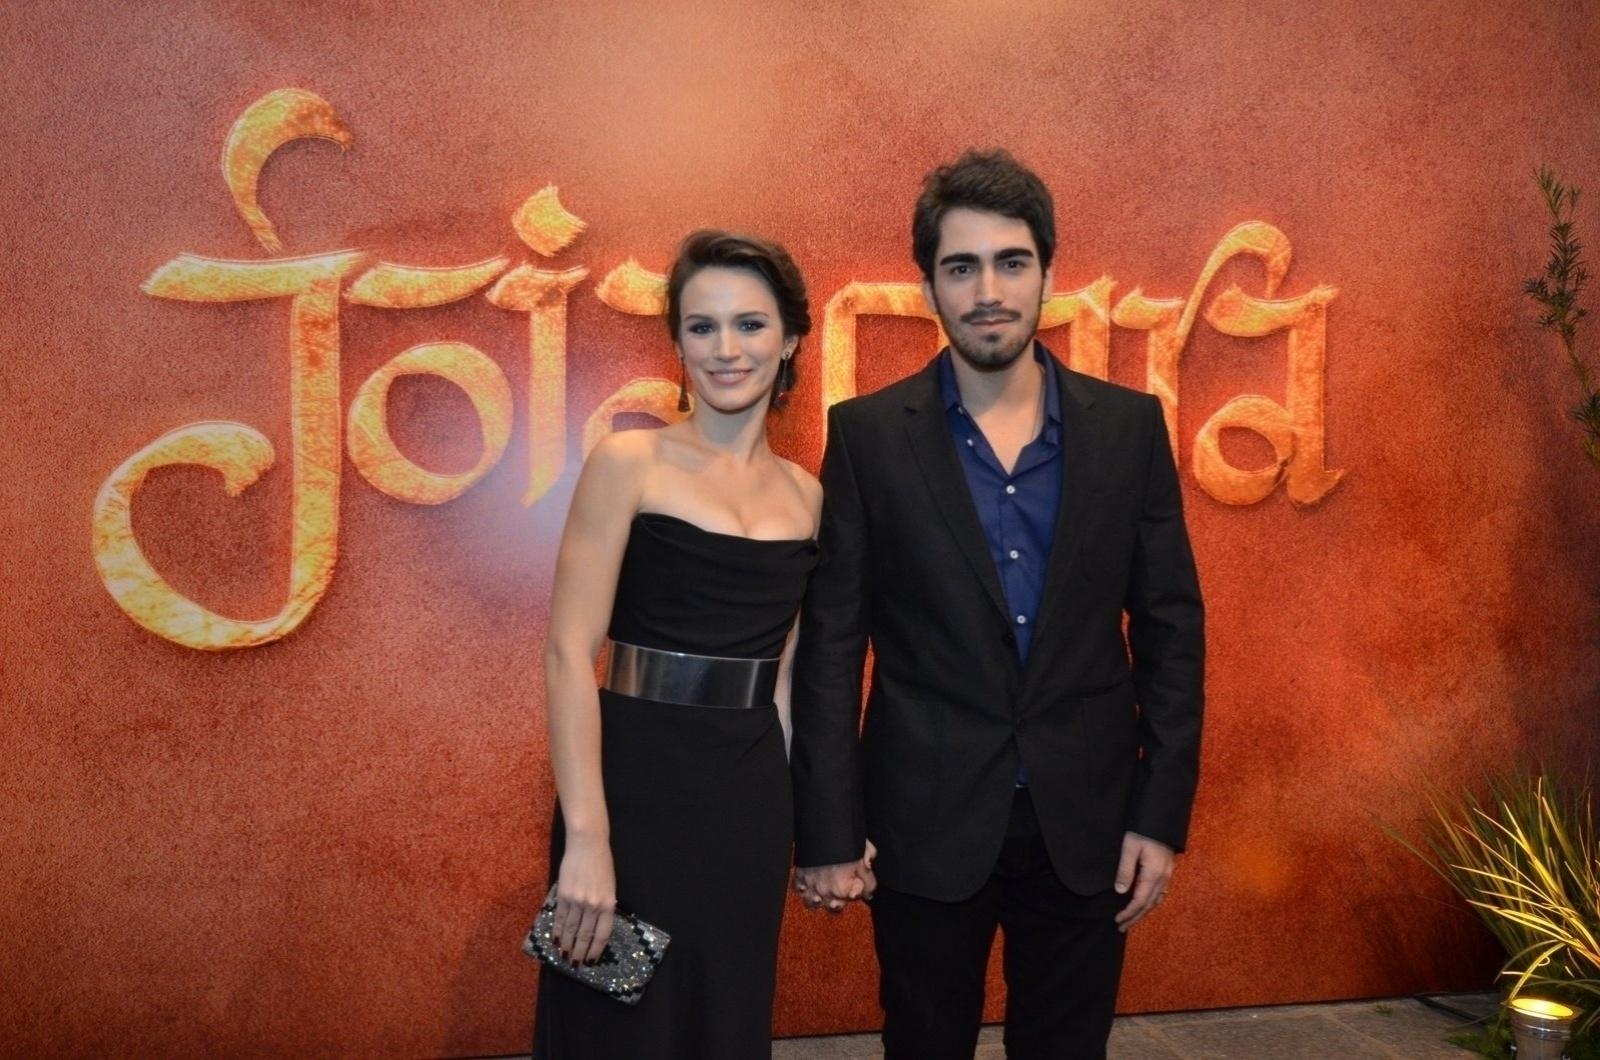 A atriz Bianca Bin e o namorado Pedro Brandão namoram desde 2011